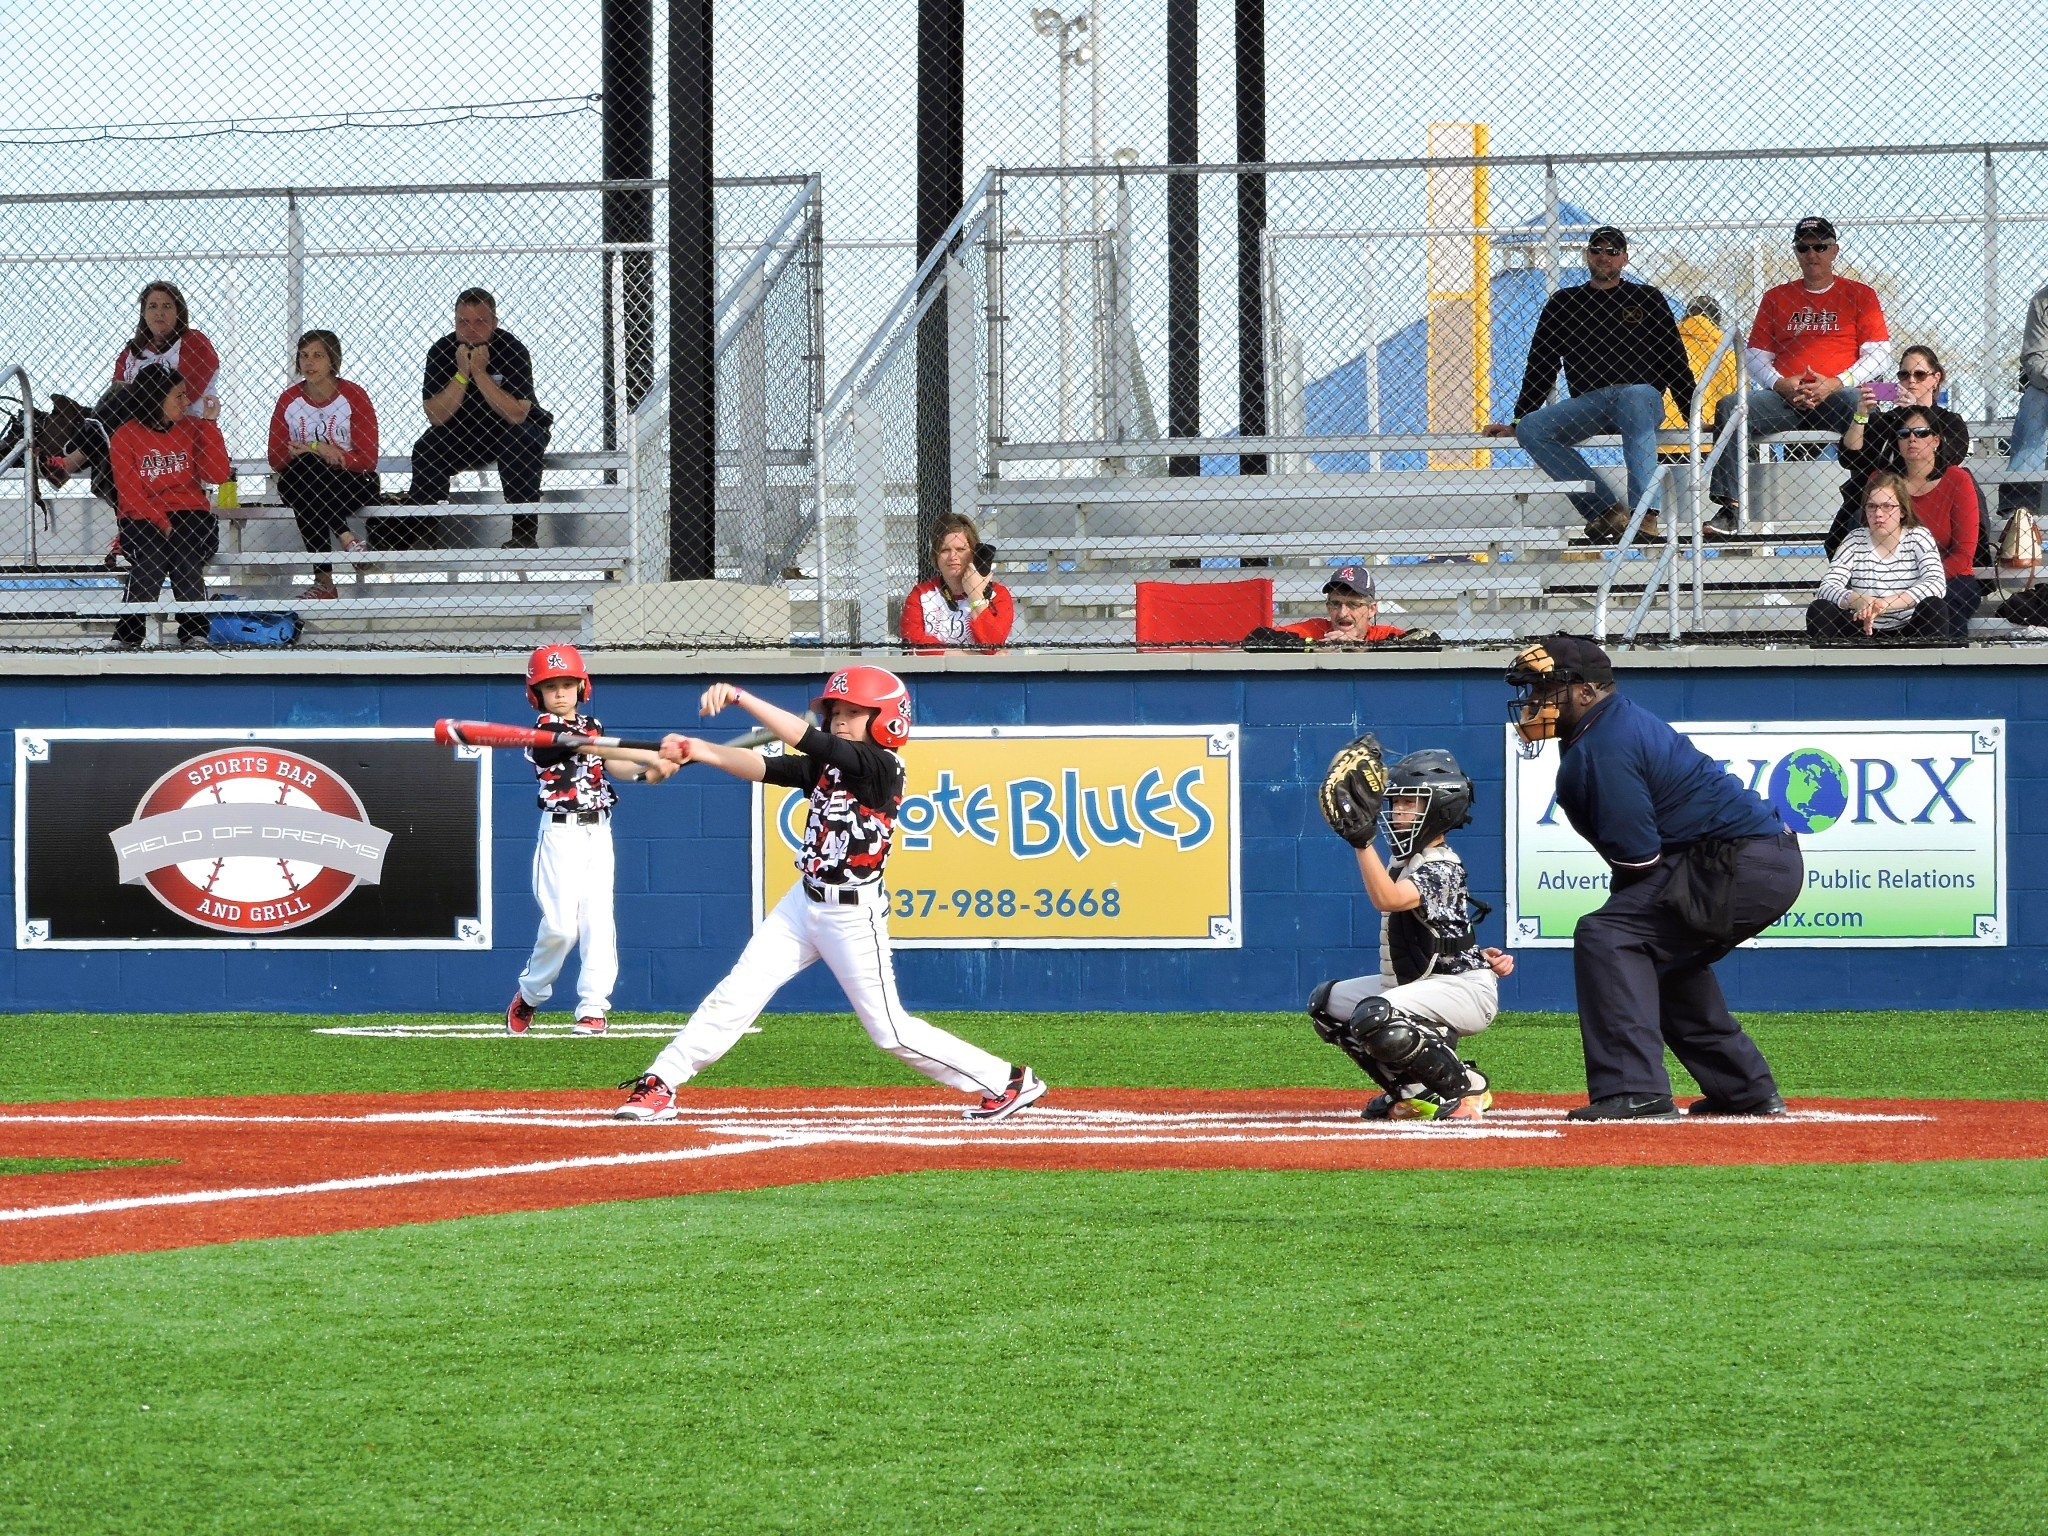 USSSA baseball tournament